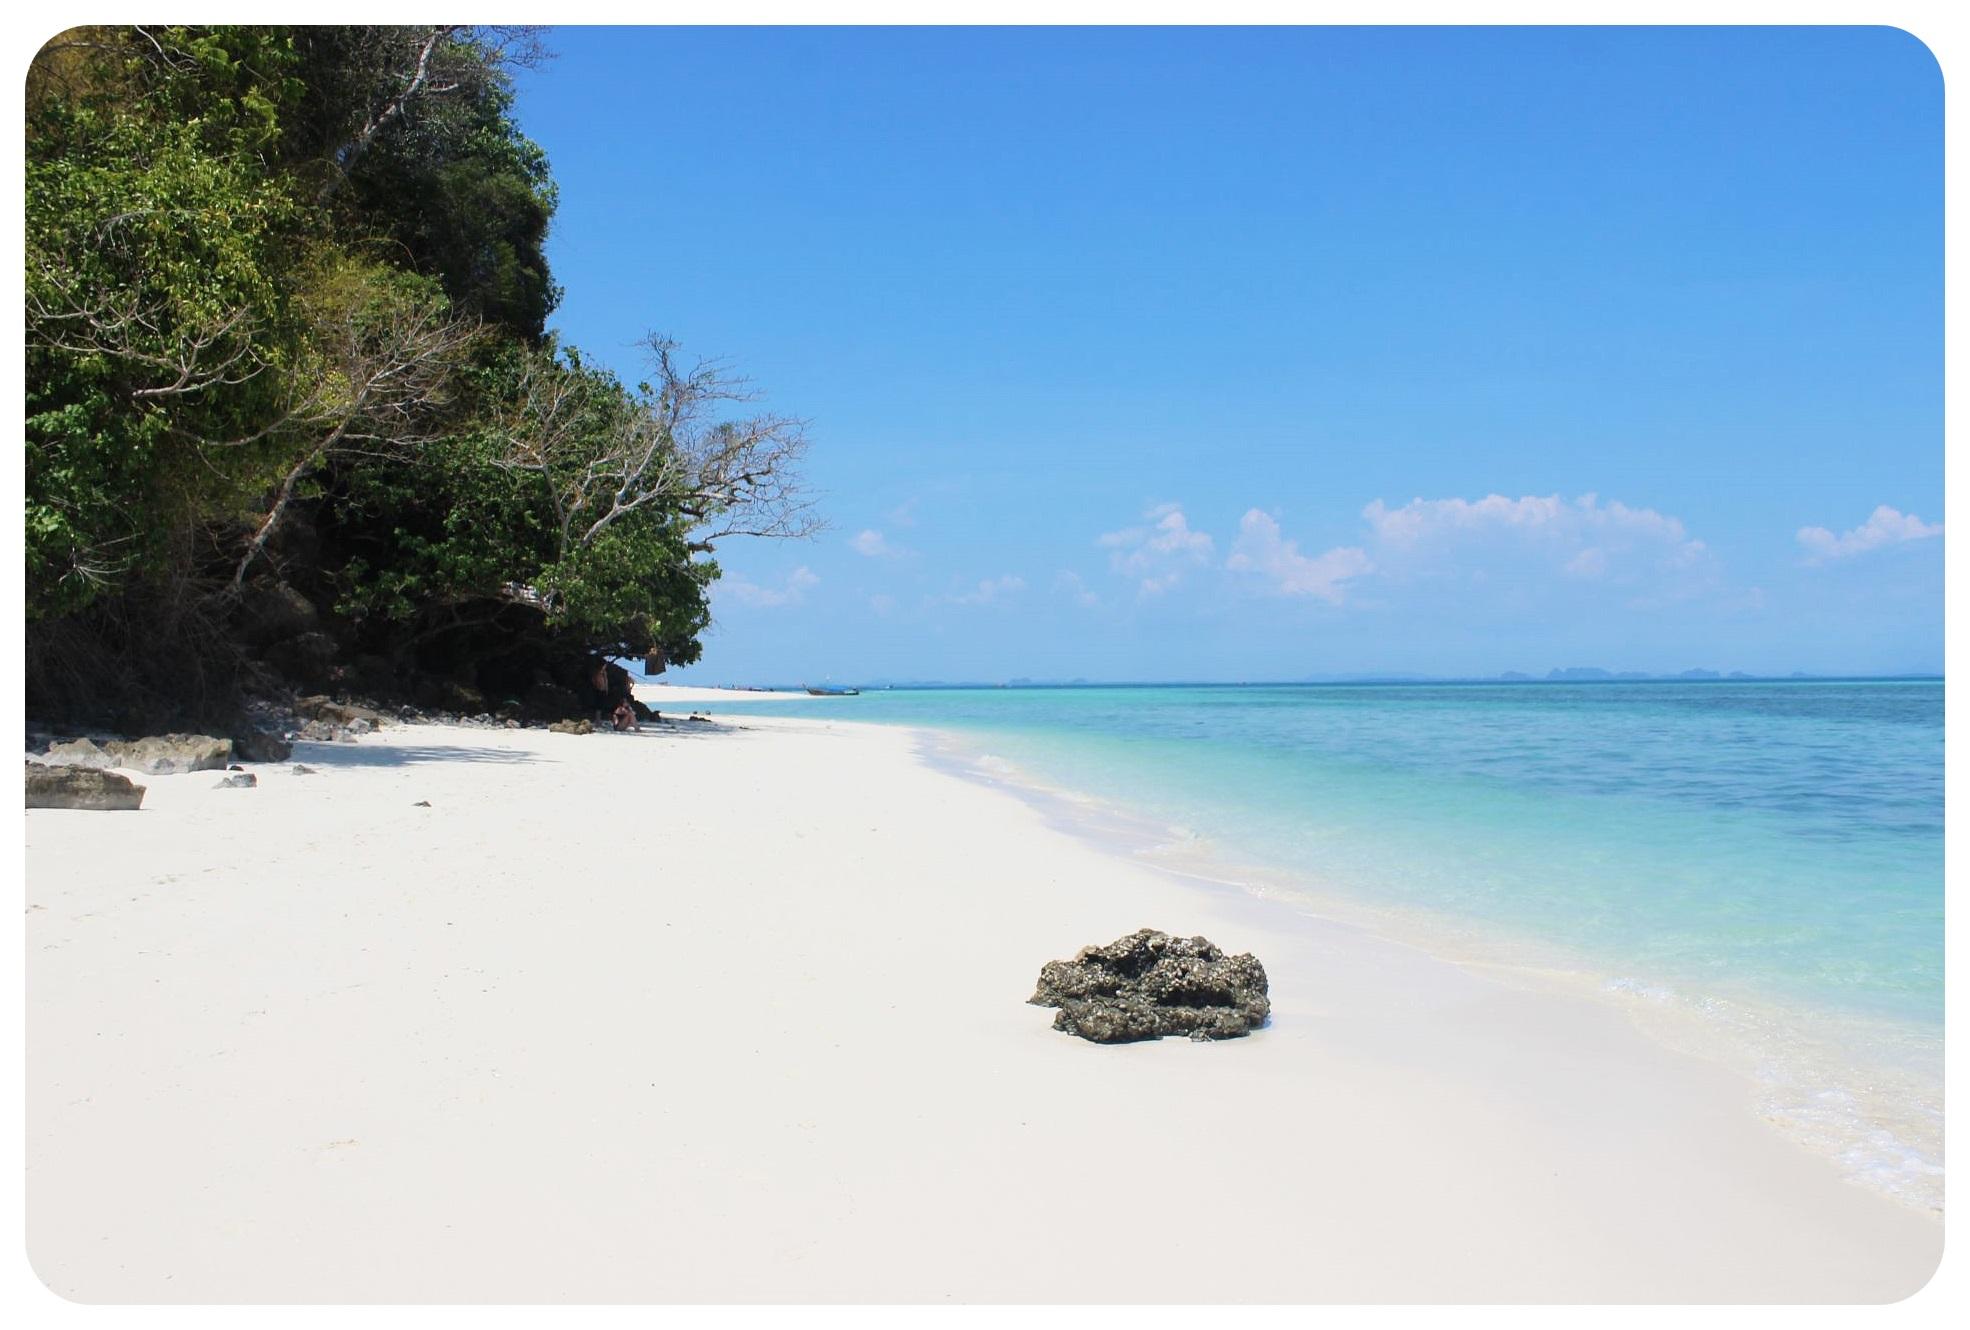 koh poda beach thailand